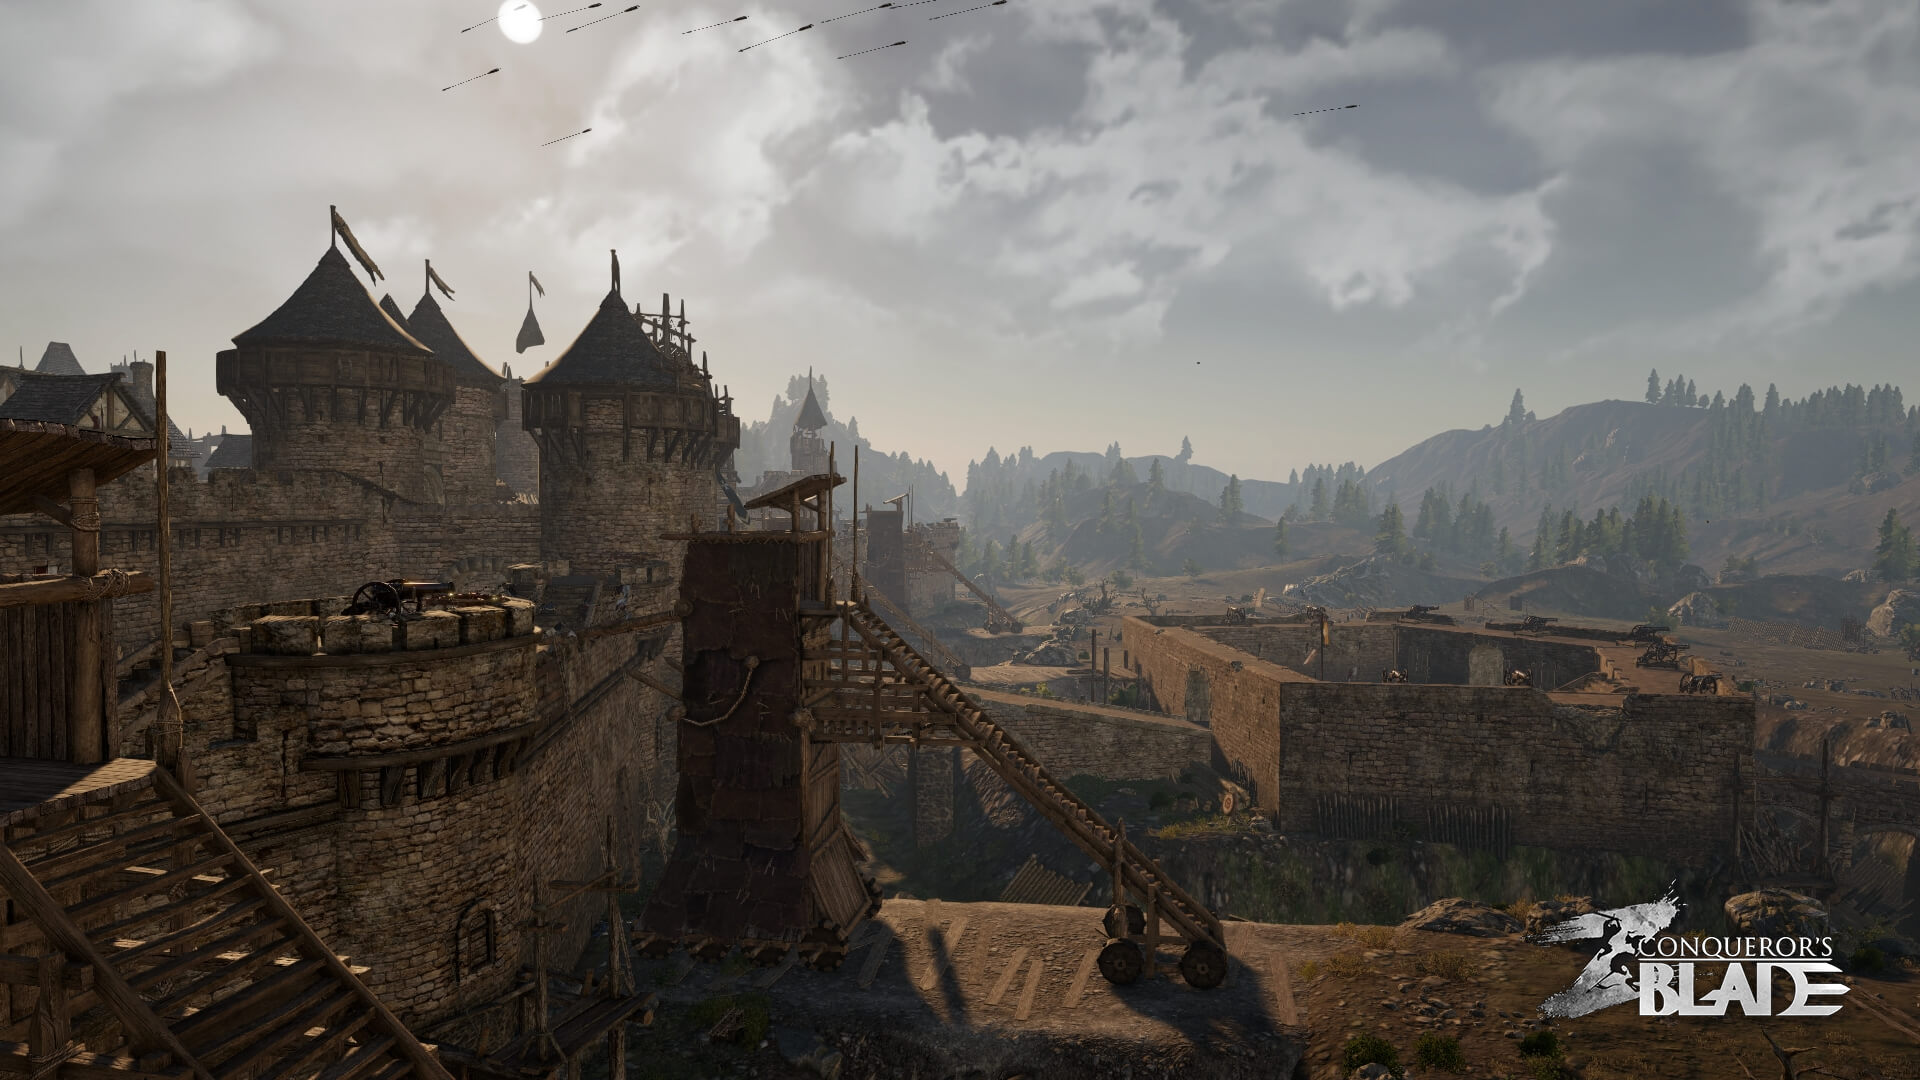 Conquerors-blade-screenshot-02